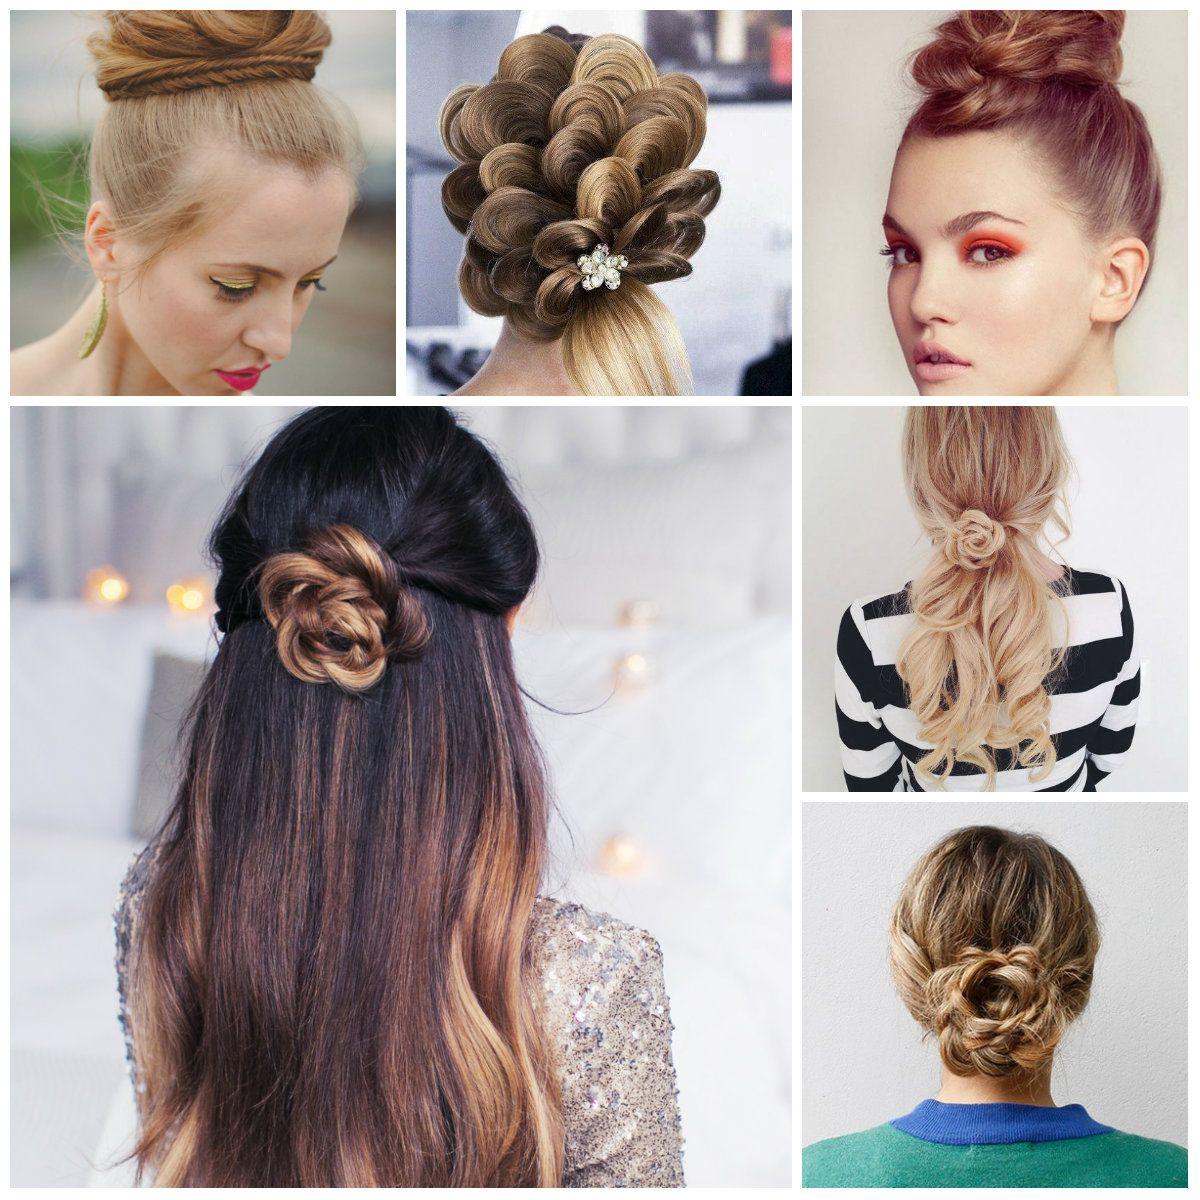 Flower Braid Hairstyles for Teens | Cute Wedding Ideas | Pinterest ...